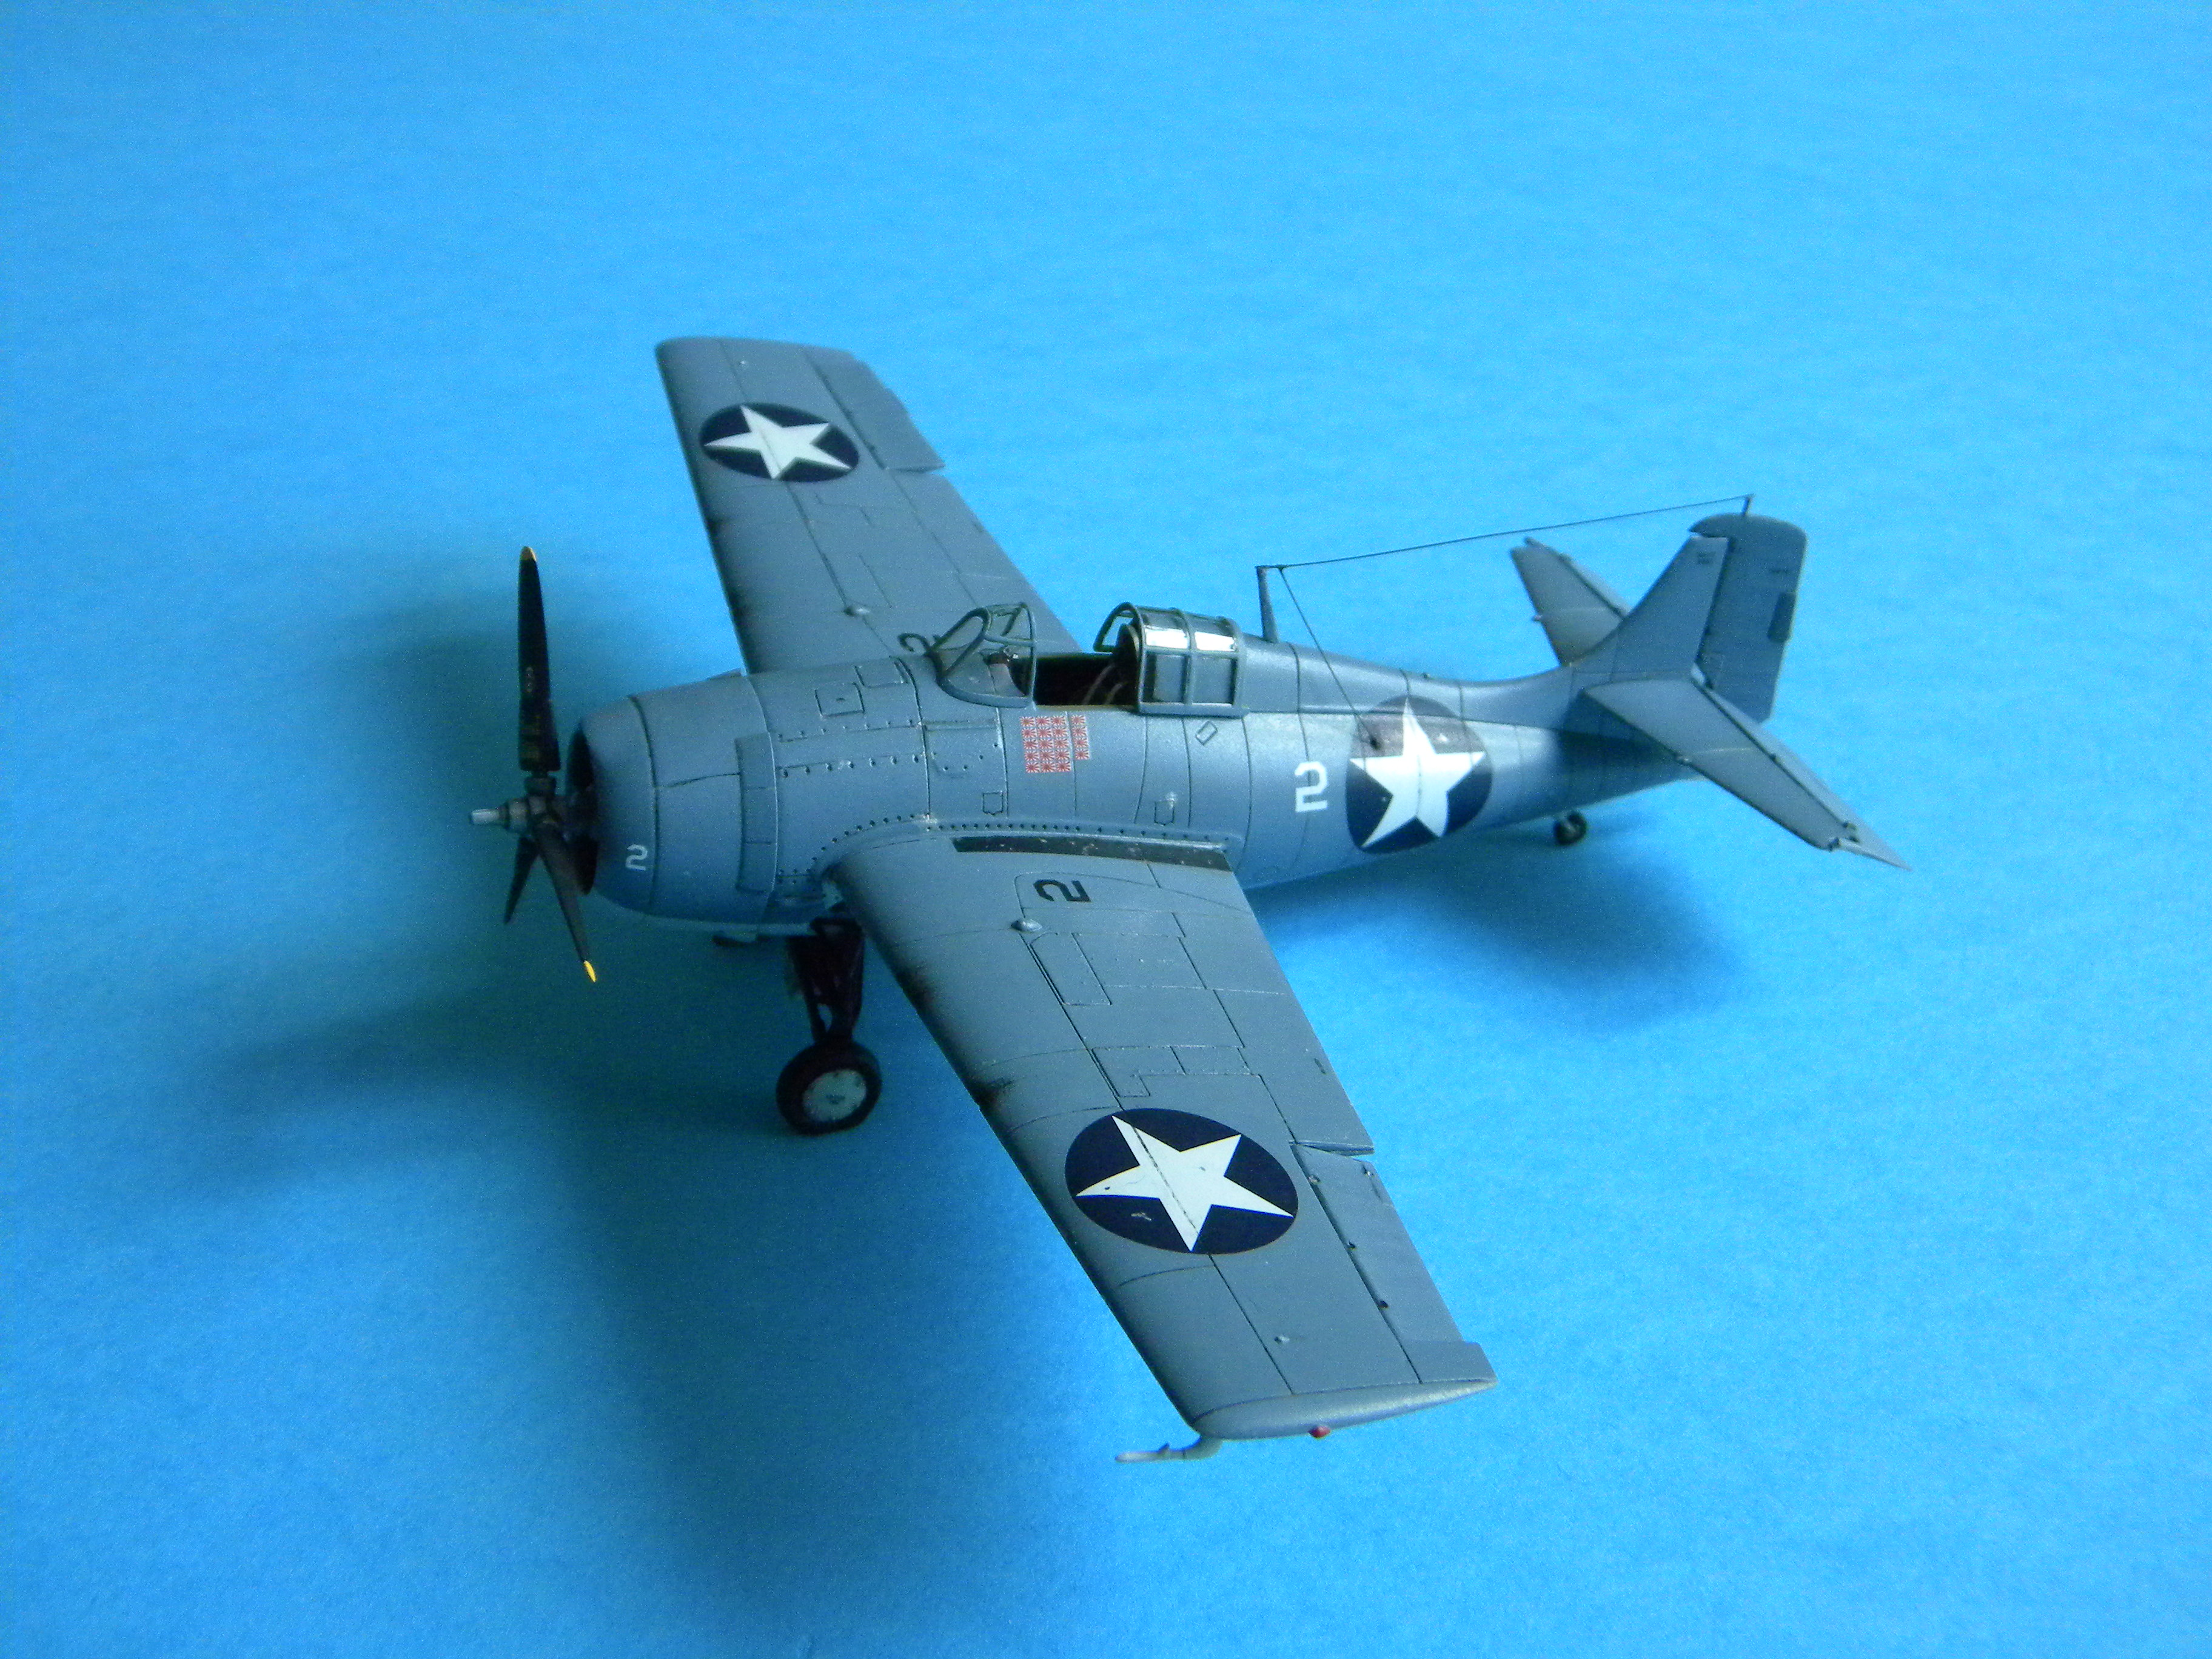 [Airfix] F4F-4 Wildcat 459833DSCN9526